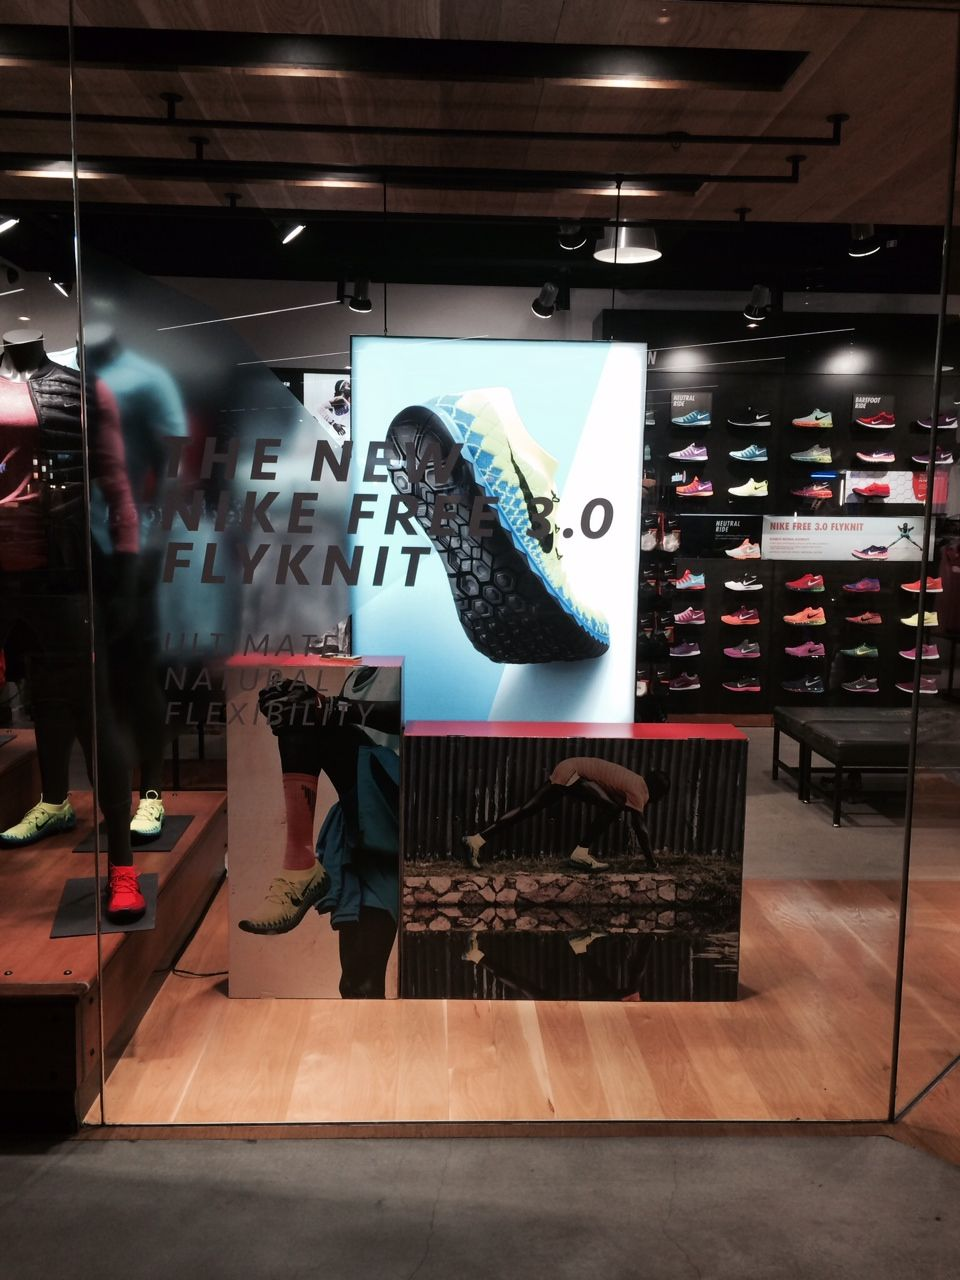 Nike Free 3.0 Flyknit retail window display light box